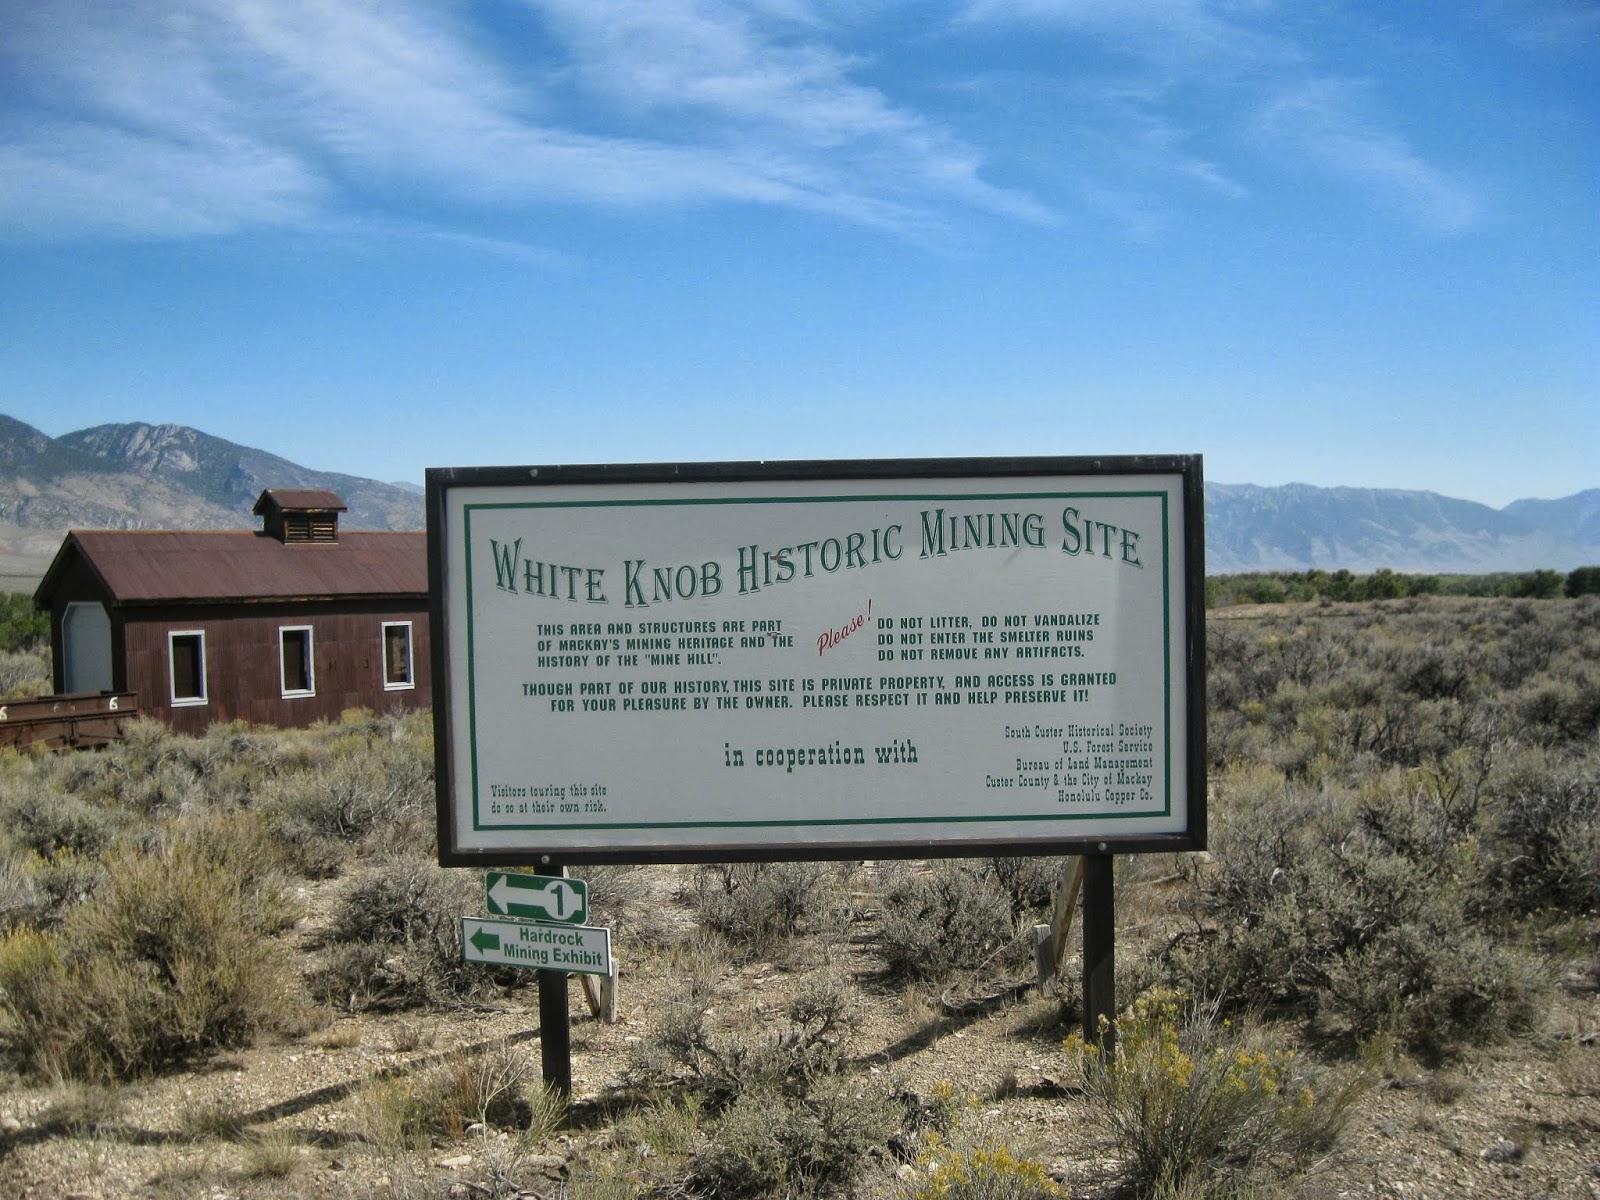 Wind Songs: White Knob Mining Site (Mackay ID) - Part 1